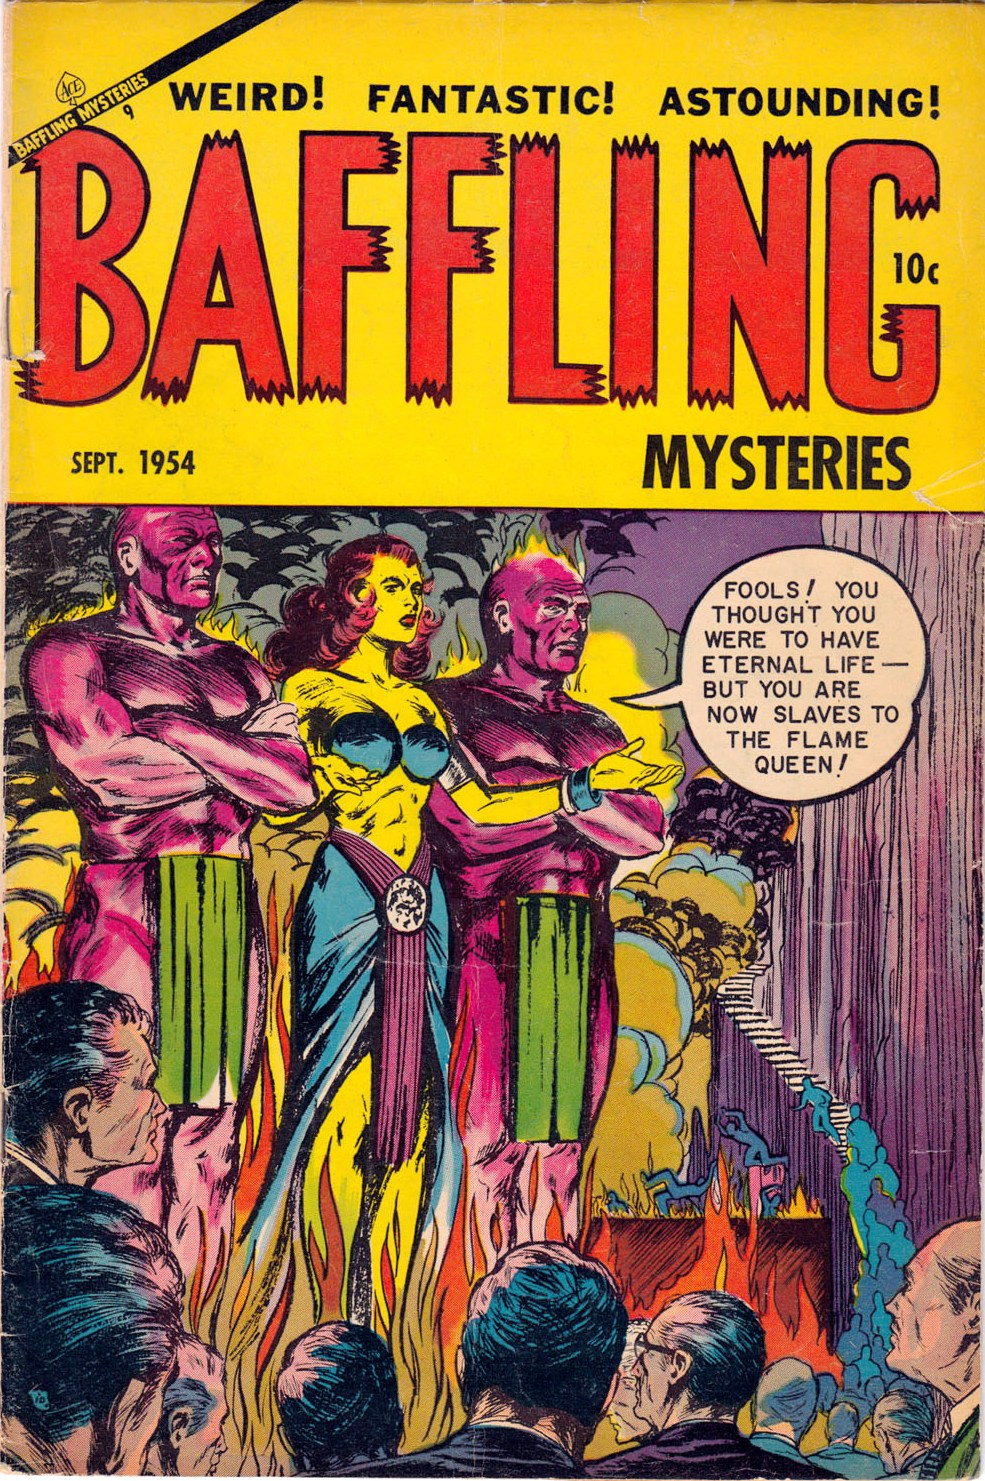 Baffling Mysteries Vol 1 22